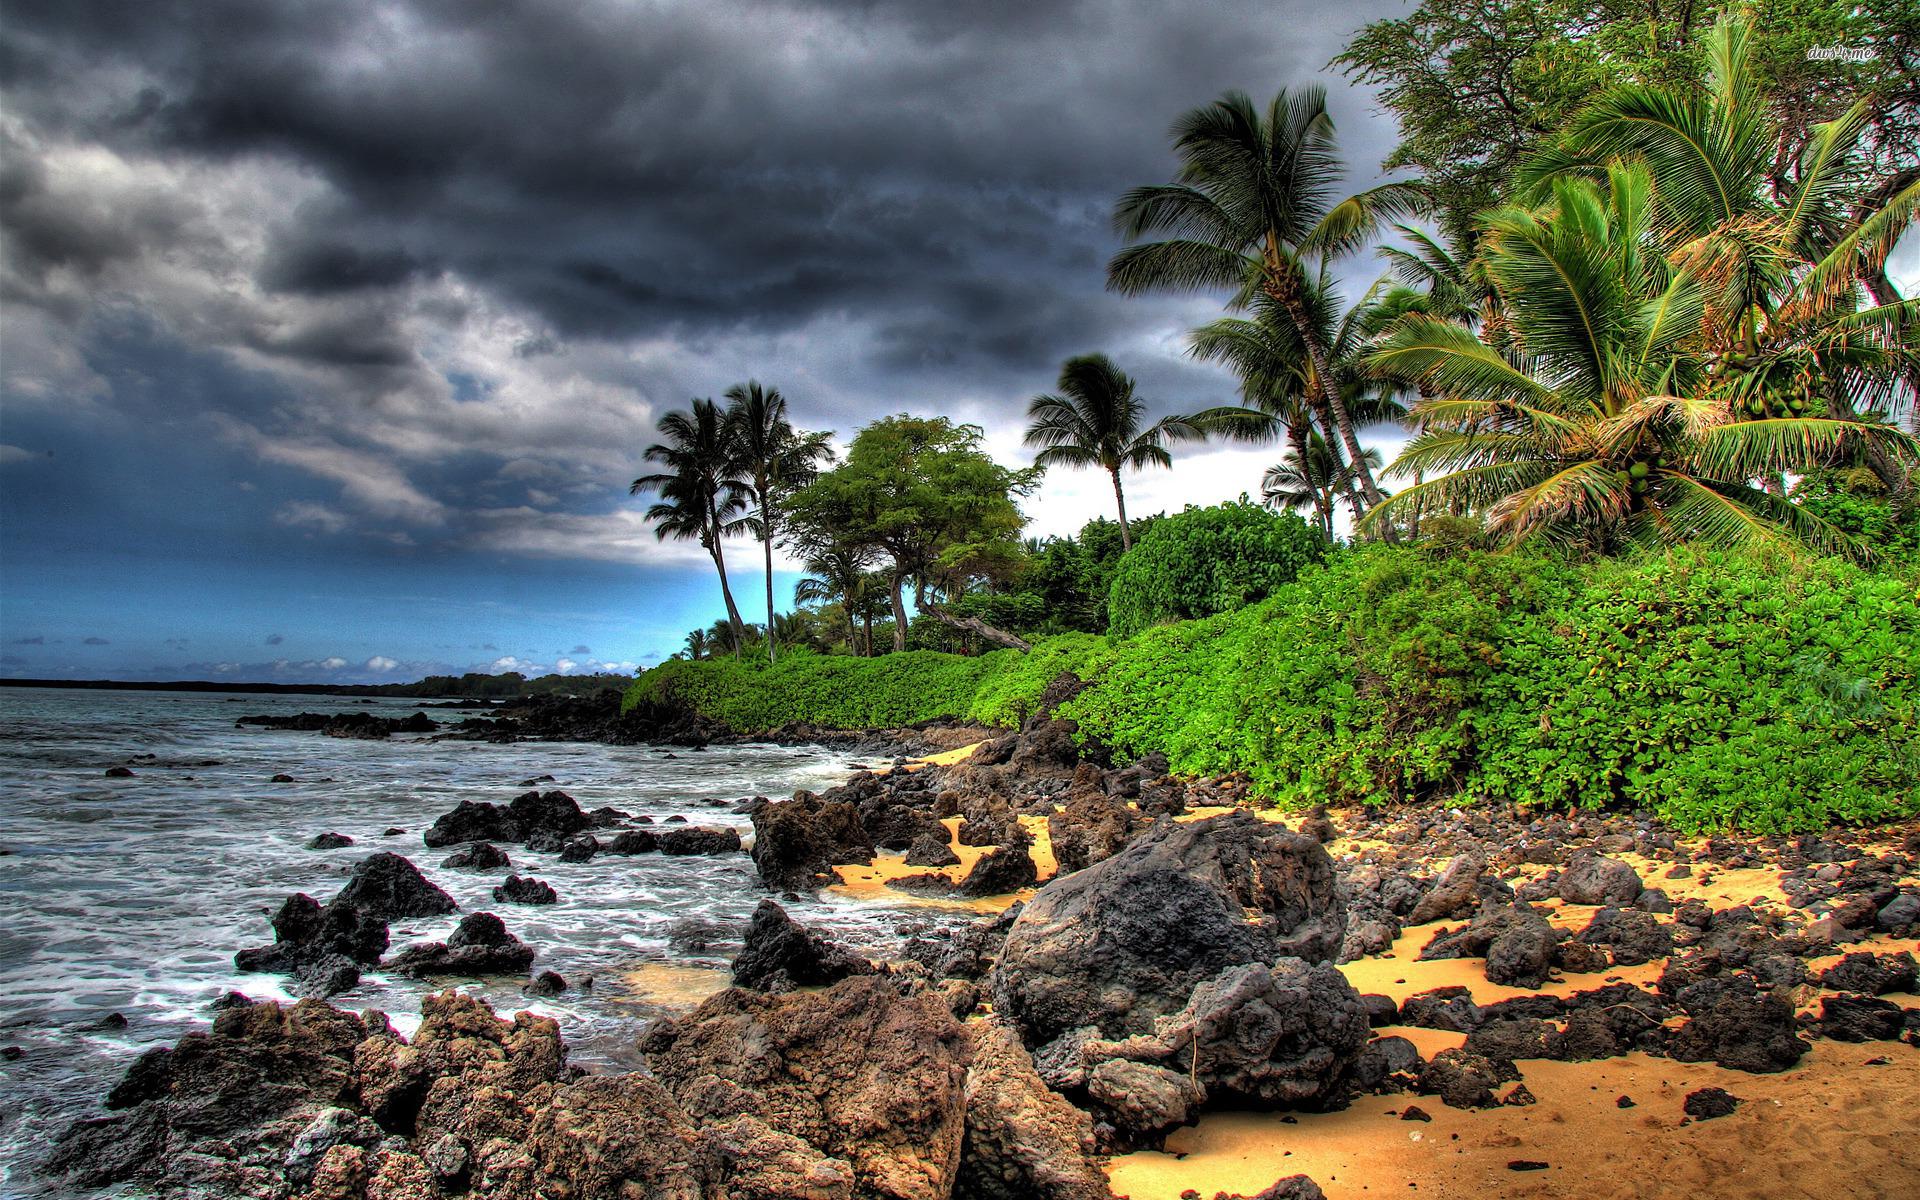 Maui Hawaii Wallpaper Desktop 1920x1200